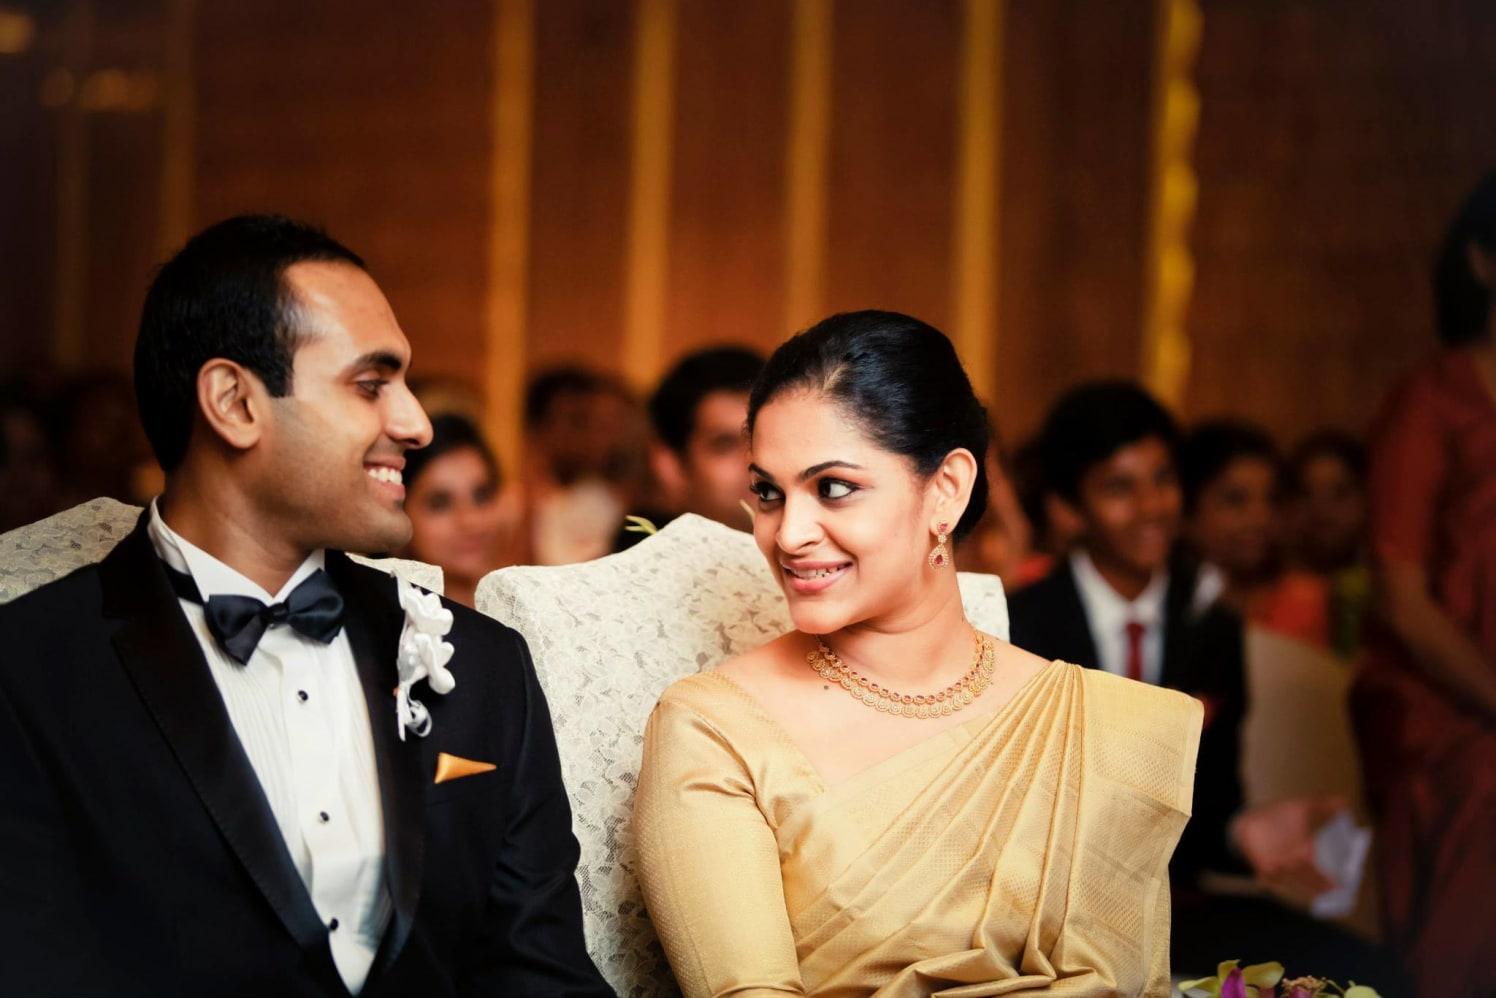 Christian Bride and Groom Wearing Elegant Traditional Wear by Bosco Naveen Wedding-photography | Weddings Photos & Ideas